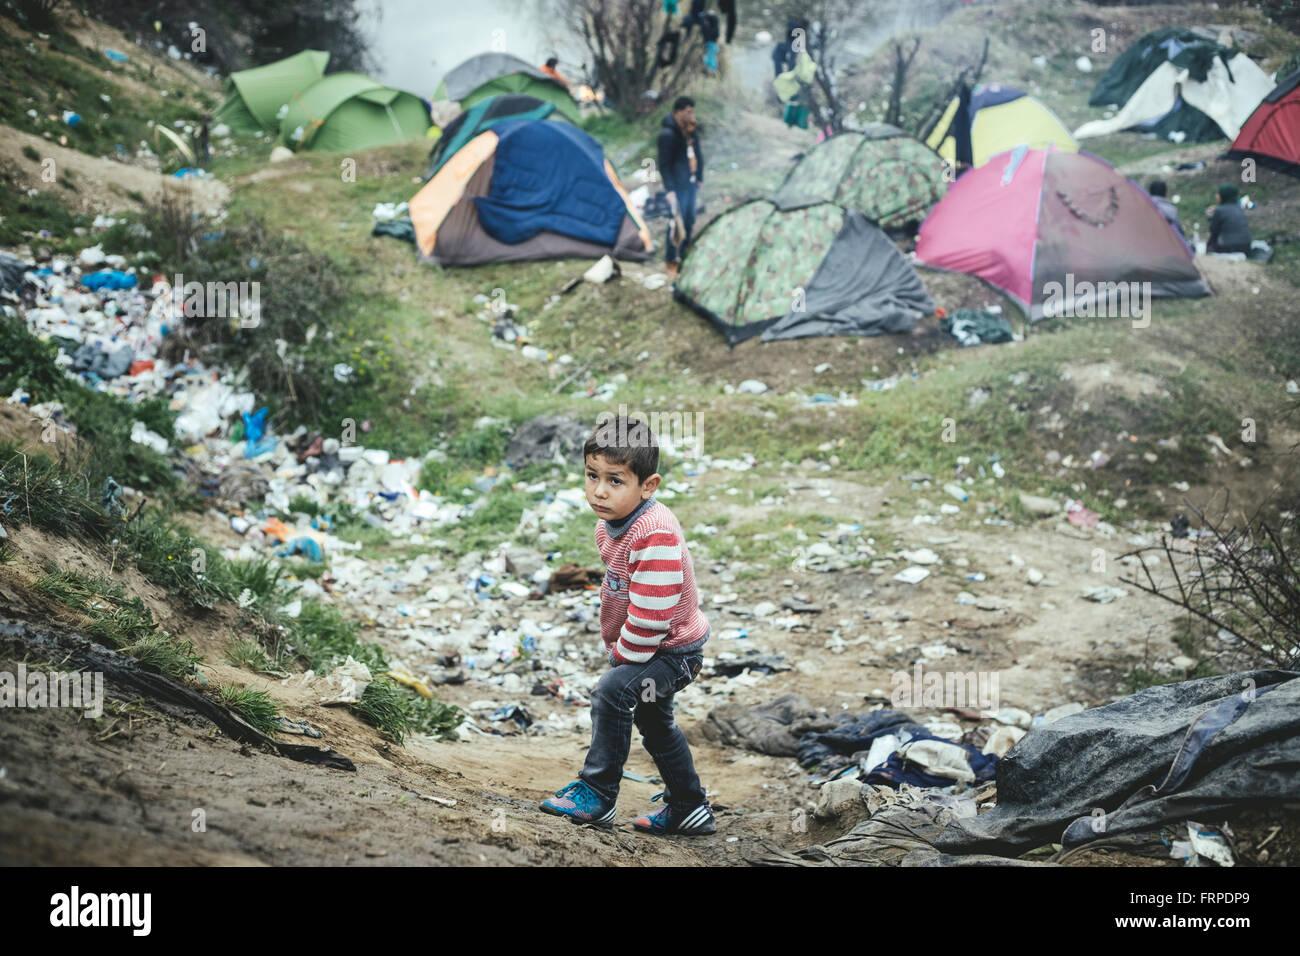 Idomeni refugee camp on Greek Macedonia border, desperate little boy, Idomeni, Central Macedonia, Greece - Stock Image